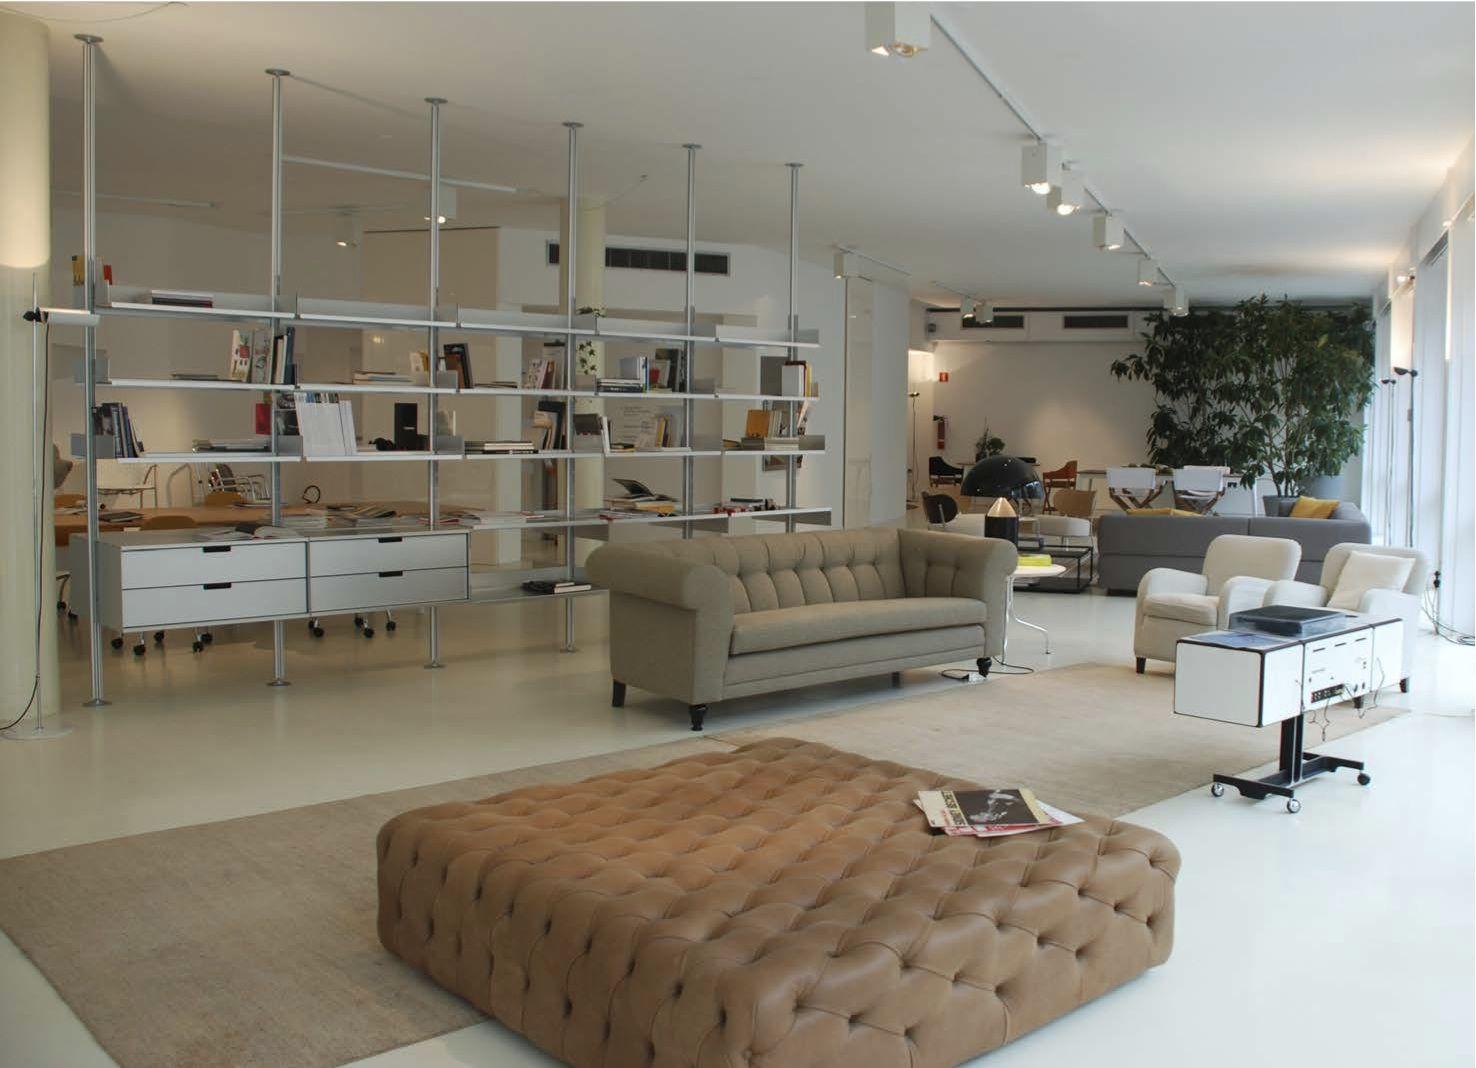 Chesterfield Sofa Showroom depadova showroom italy pouf capitonne chesterfield sofa